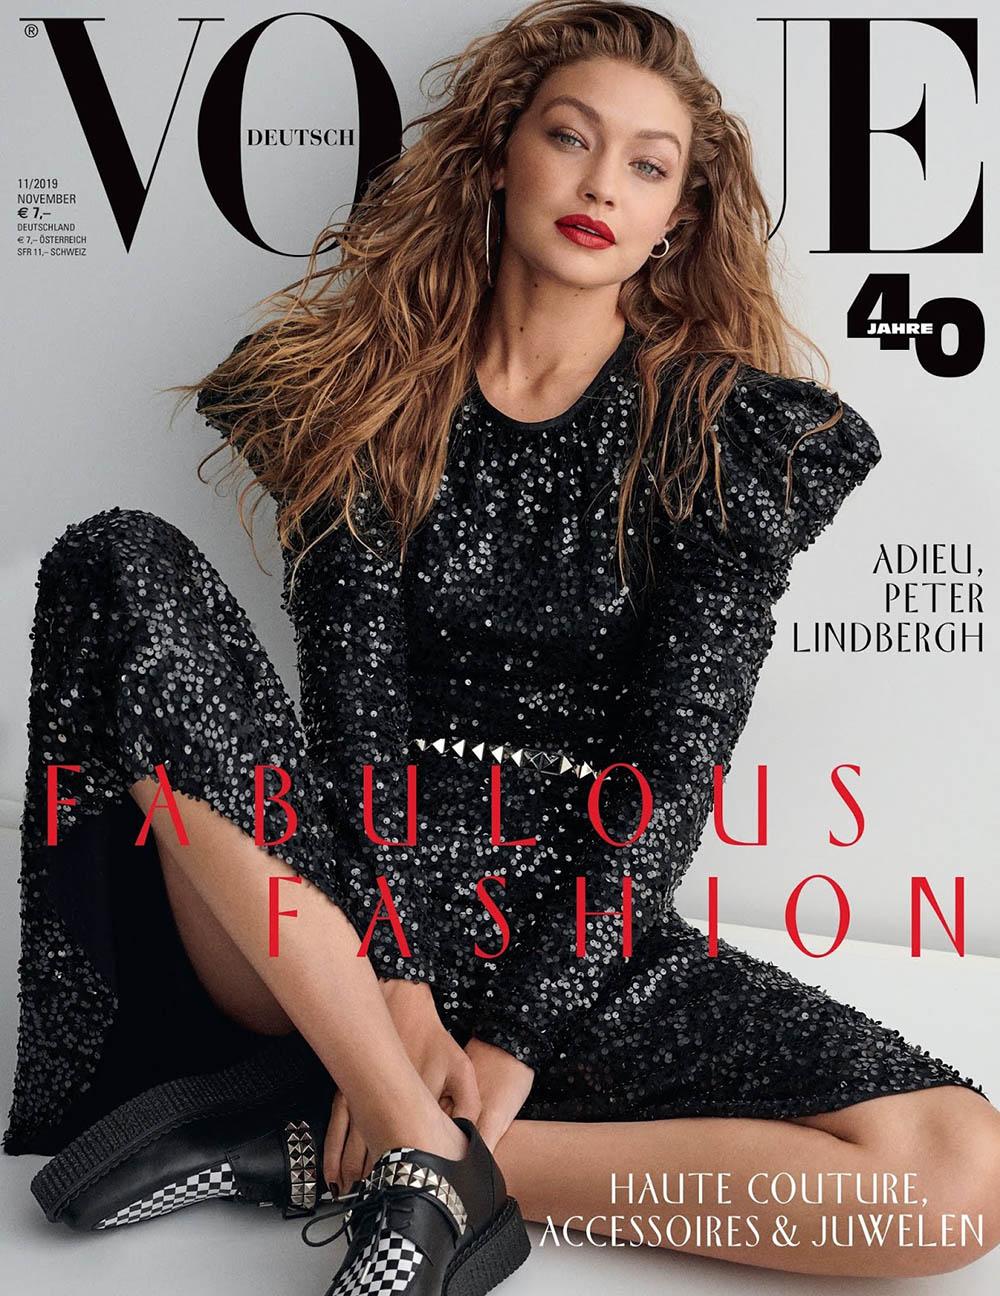 Gigi Hadid covers Vogue Germany November 2019 by Giampaolo Sgura